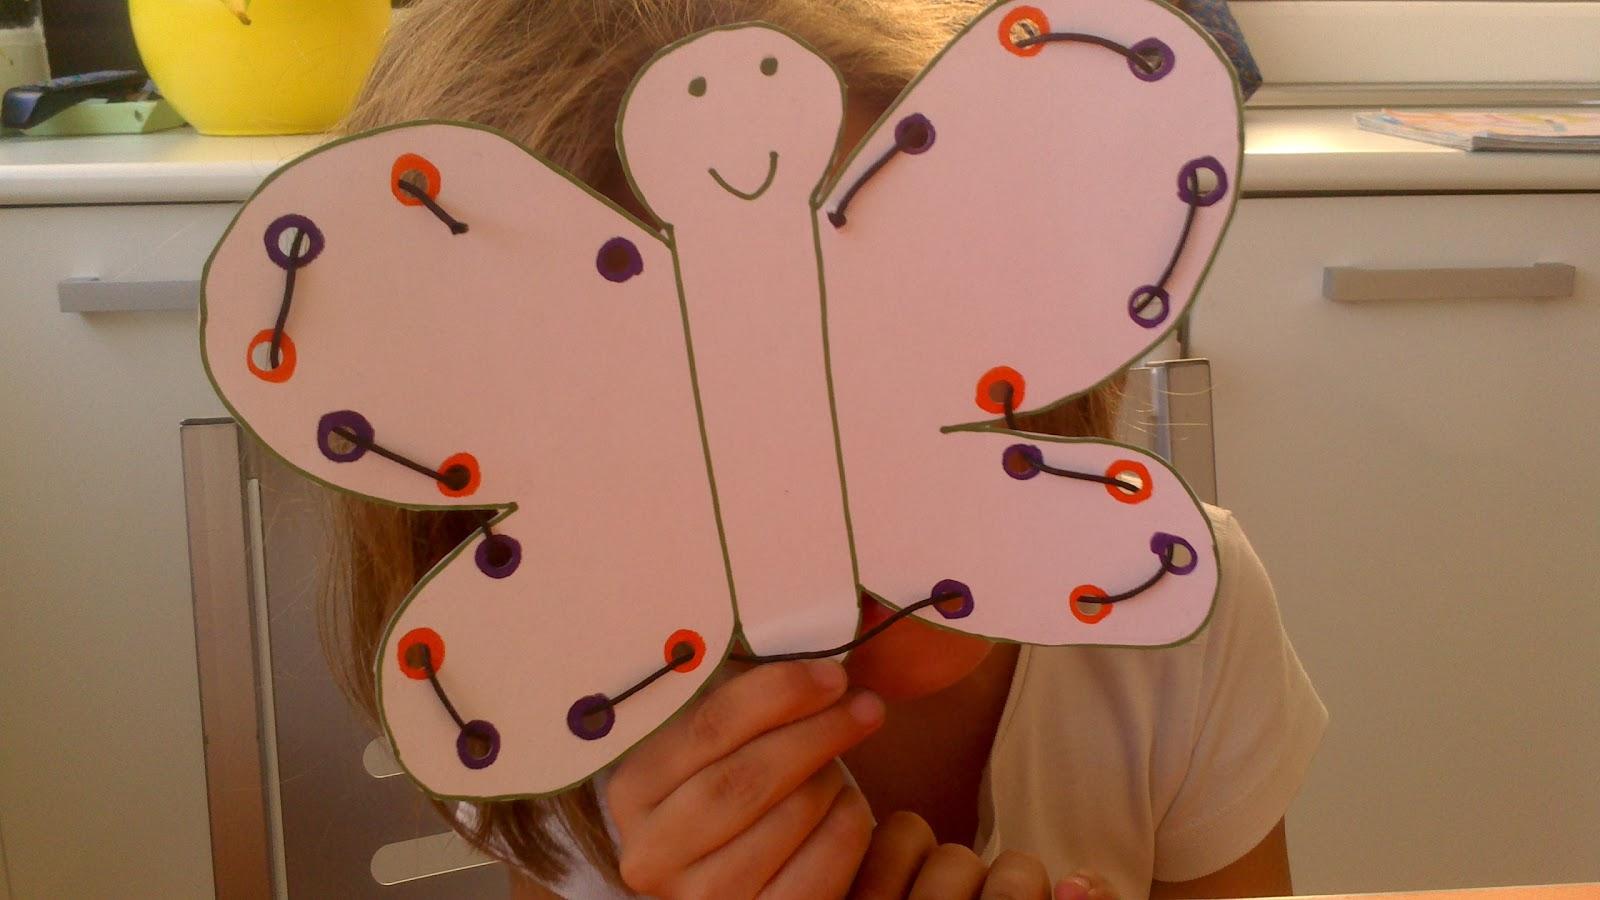 http://atempramv.blogspot.com.es/2013/10/trabajando-la-motricidad-fina-mariposas.html